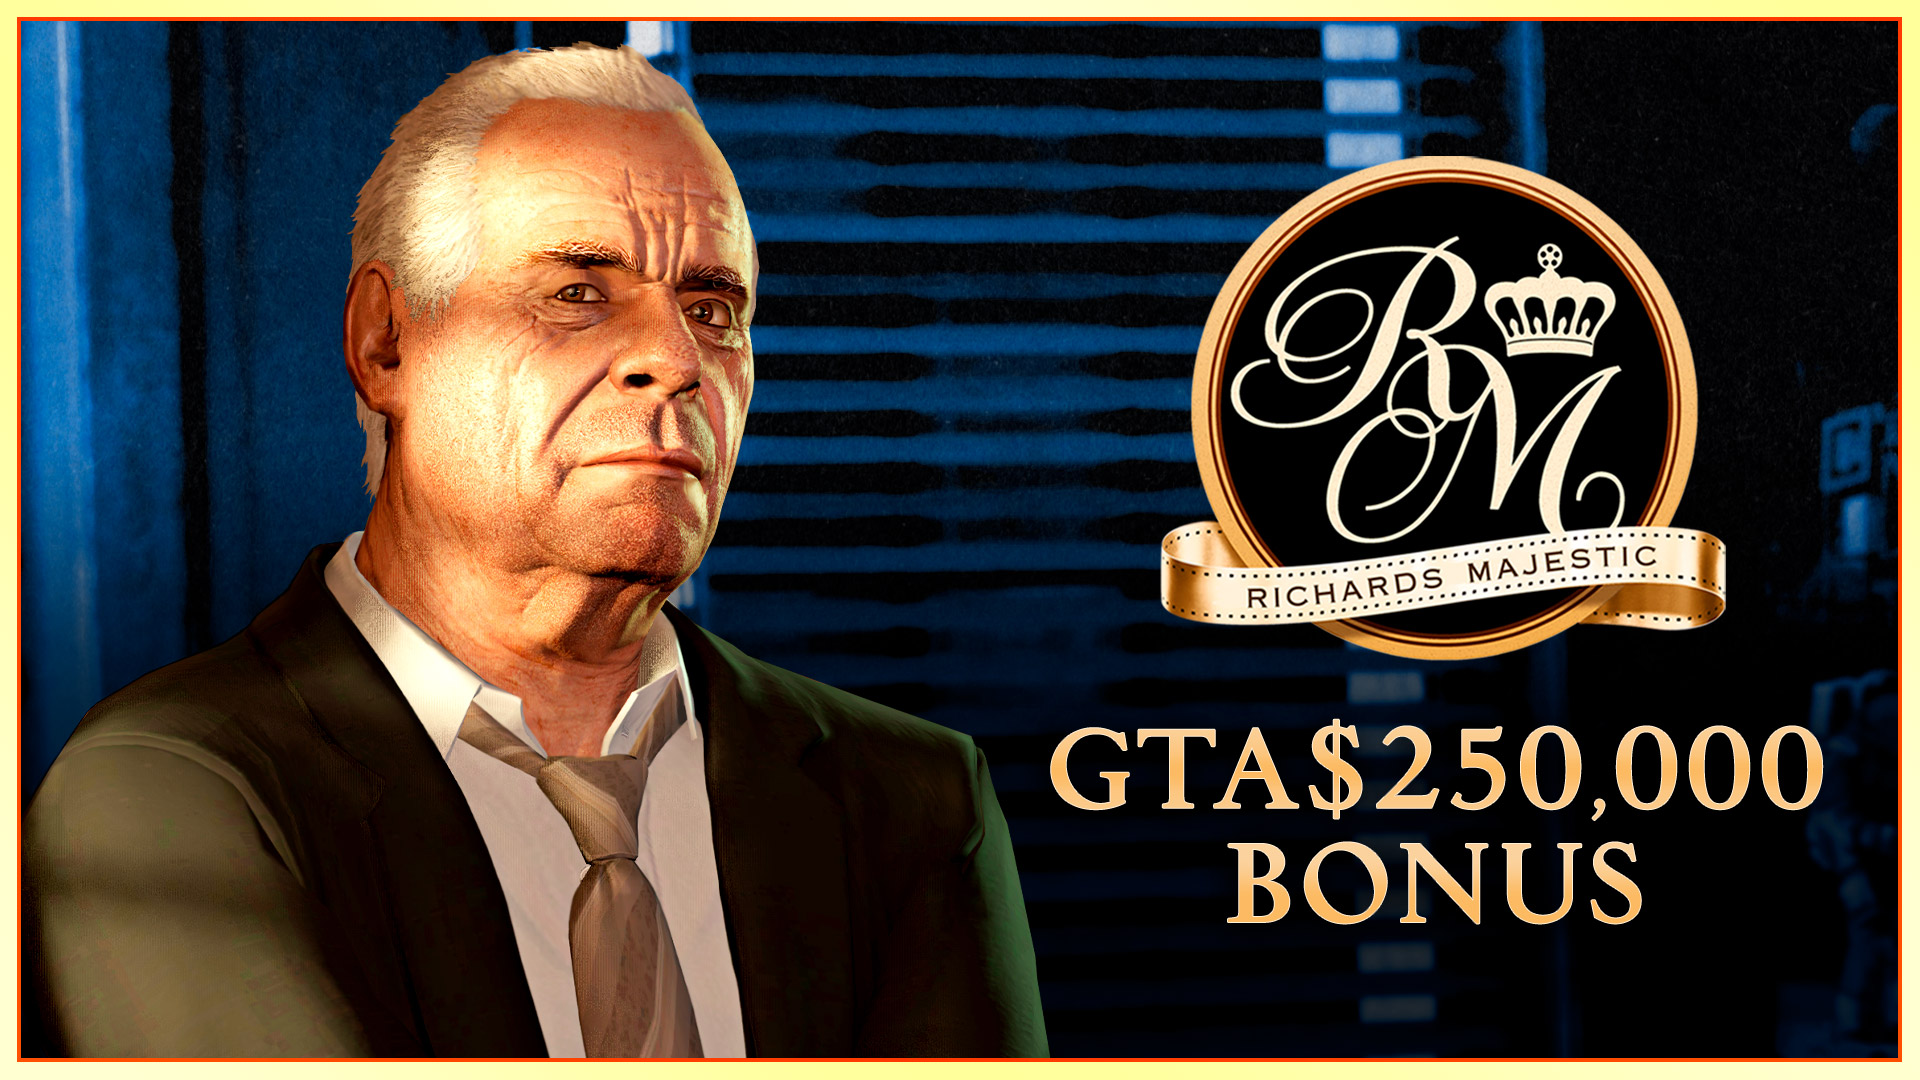 GTA Online Bonus Richard Majestic